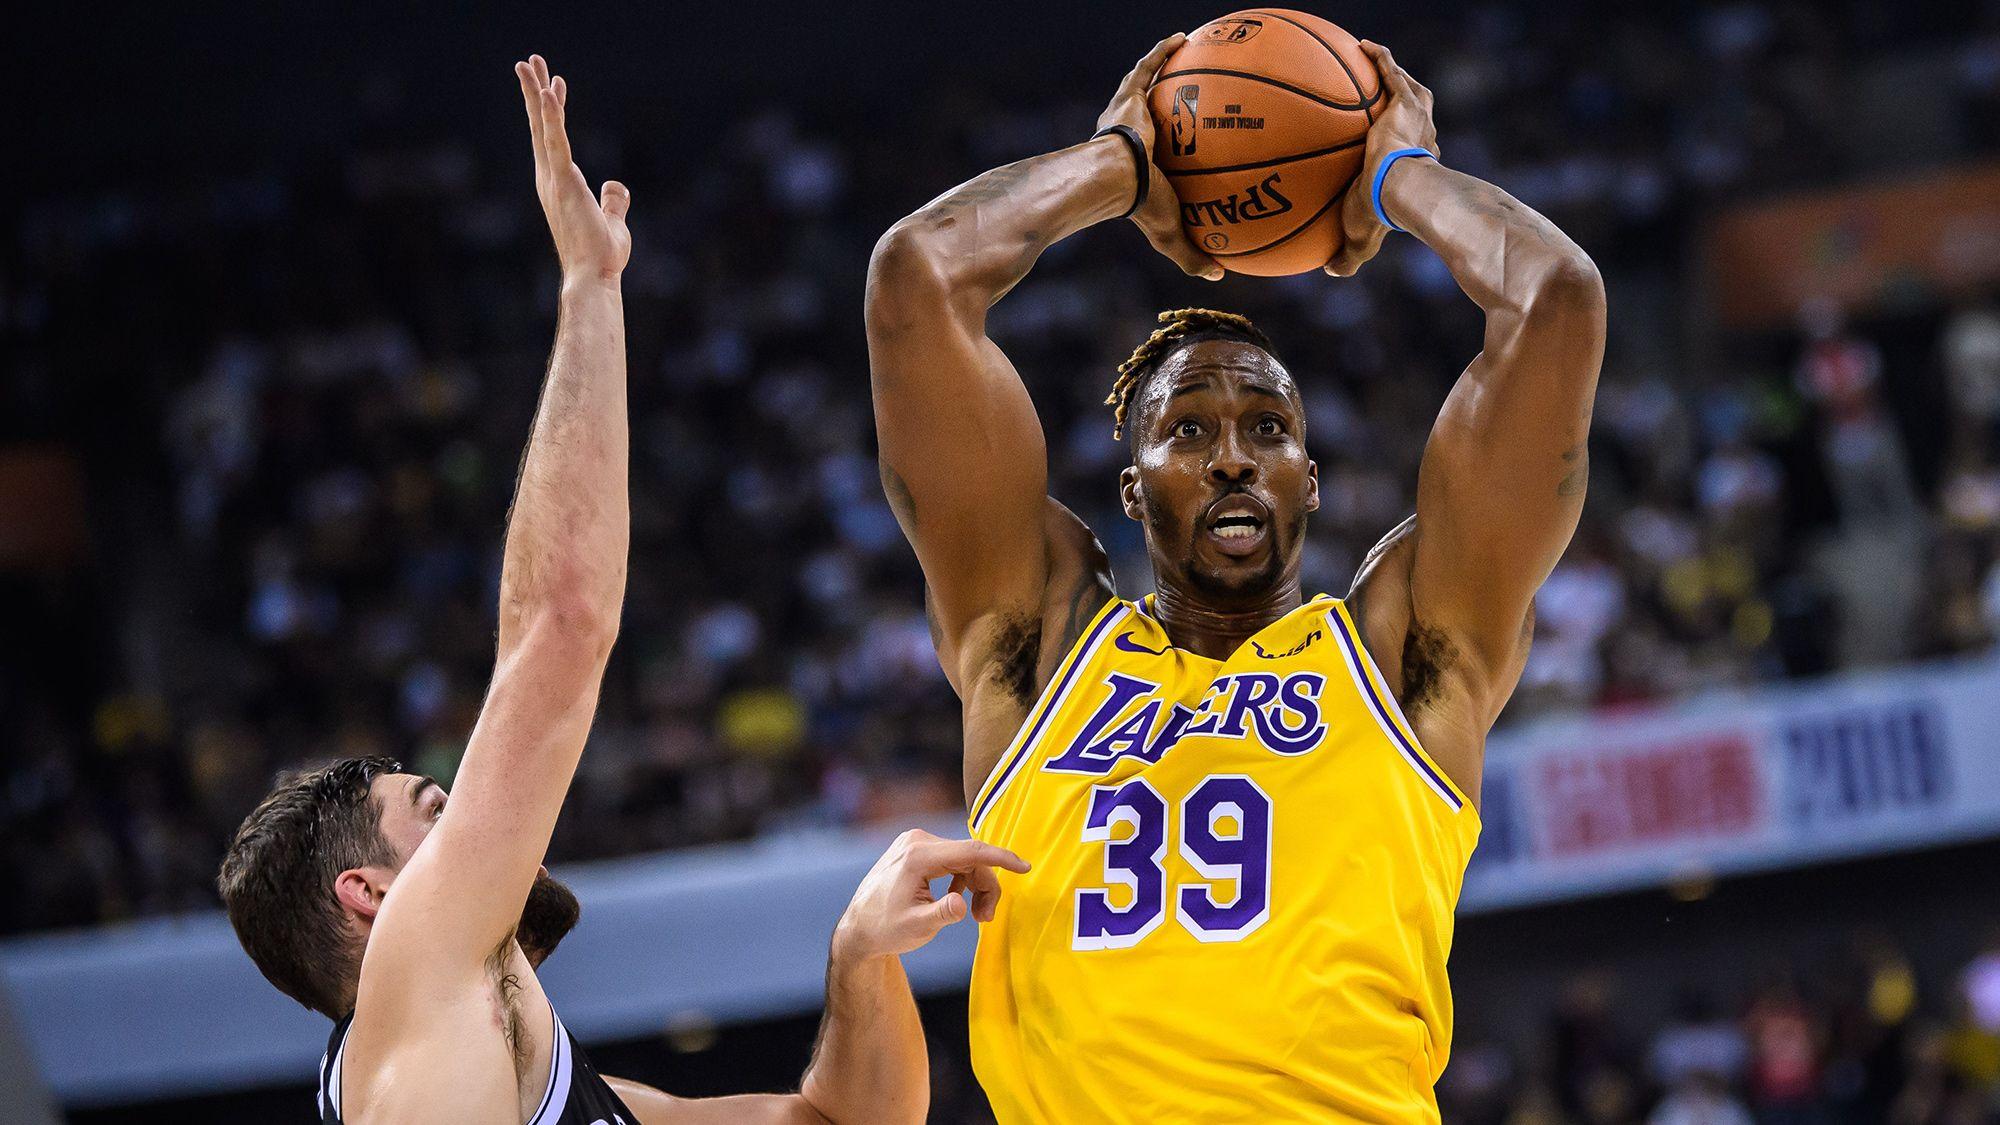 Lakers Dwight Howard Selling Plush Dc Penthouse In A Converted School In 2020 Dwight Howard Lakers Dwight